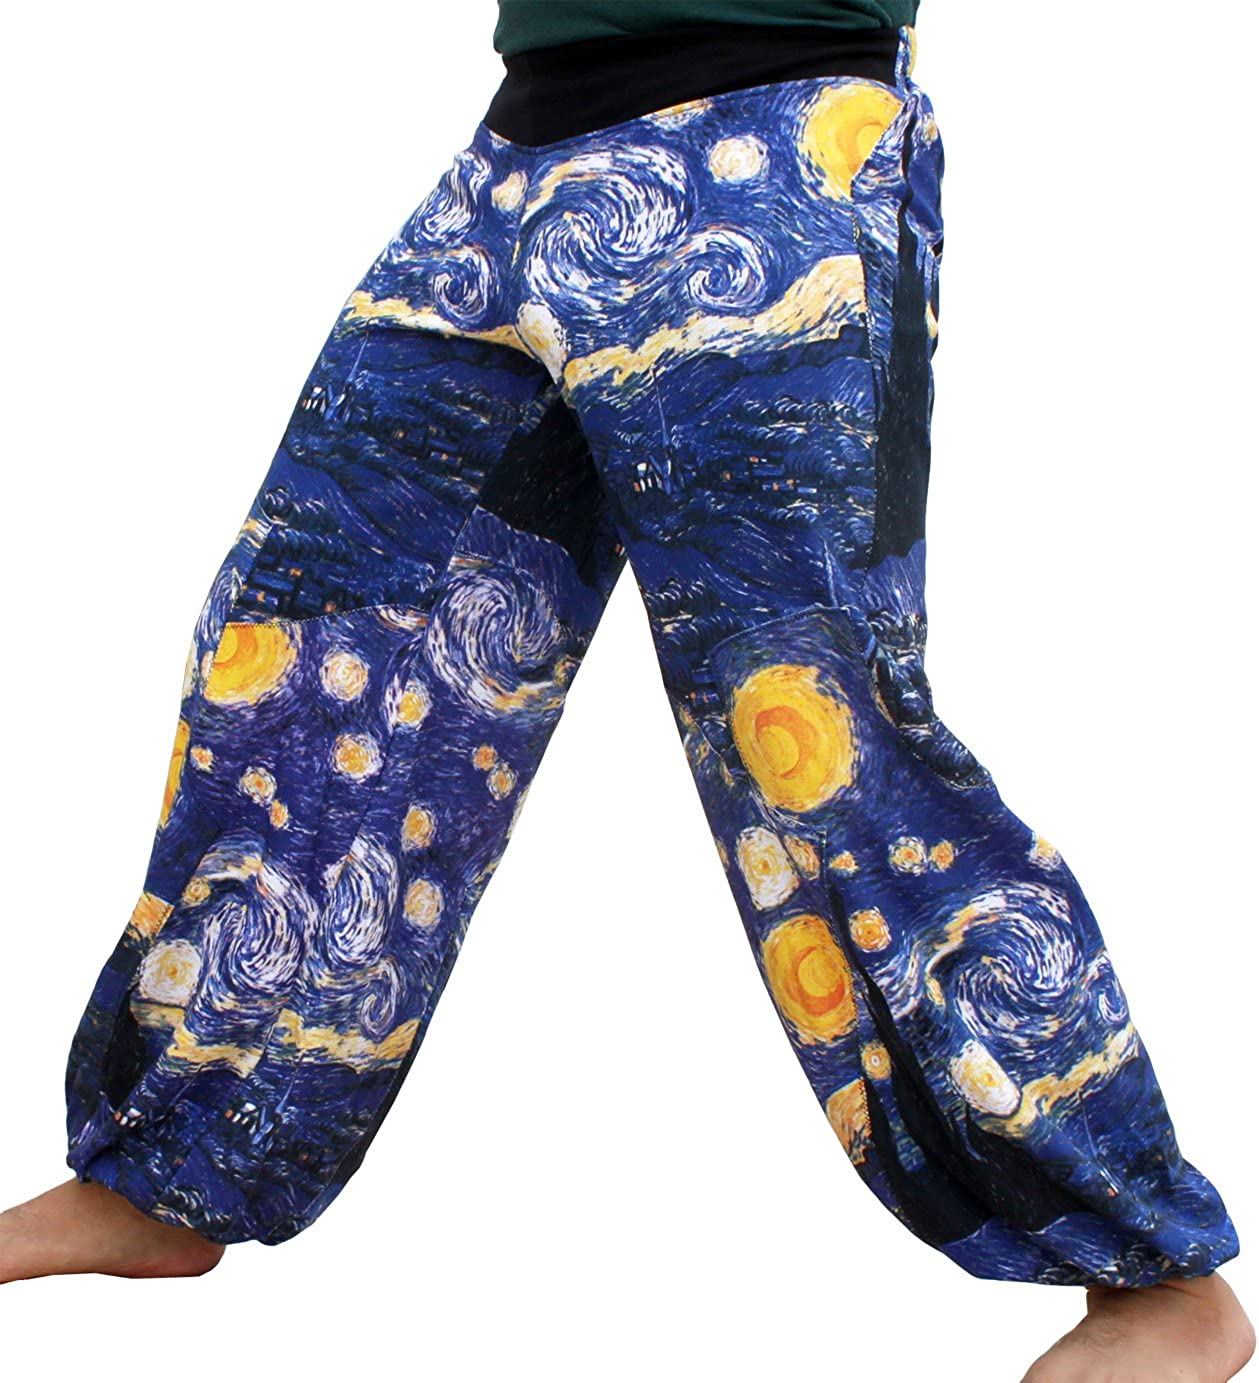 RaanPahMuang Brand Miami Mall Full Patch Billowy Pants Starry The Van List price Gogh